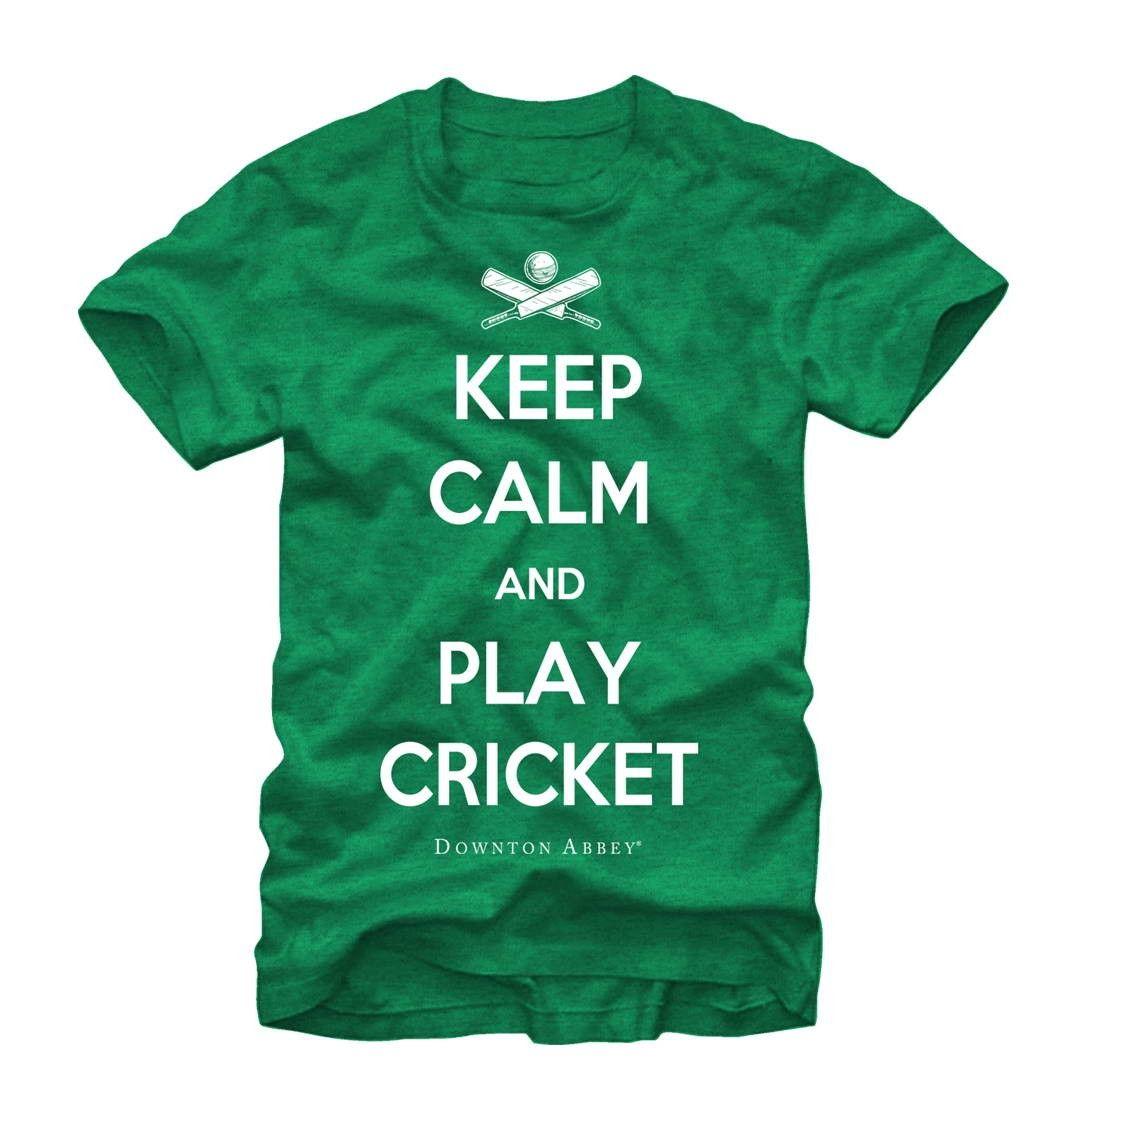 Downton Abbey Men's - Keep Calm and Play Cricket T Shirt #downton #downtonabbey #pbs